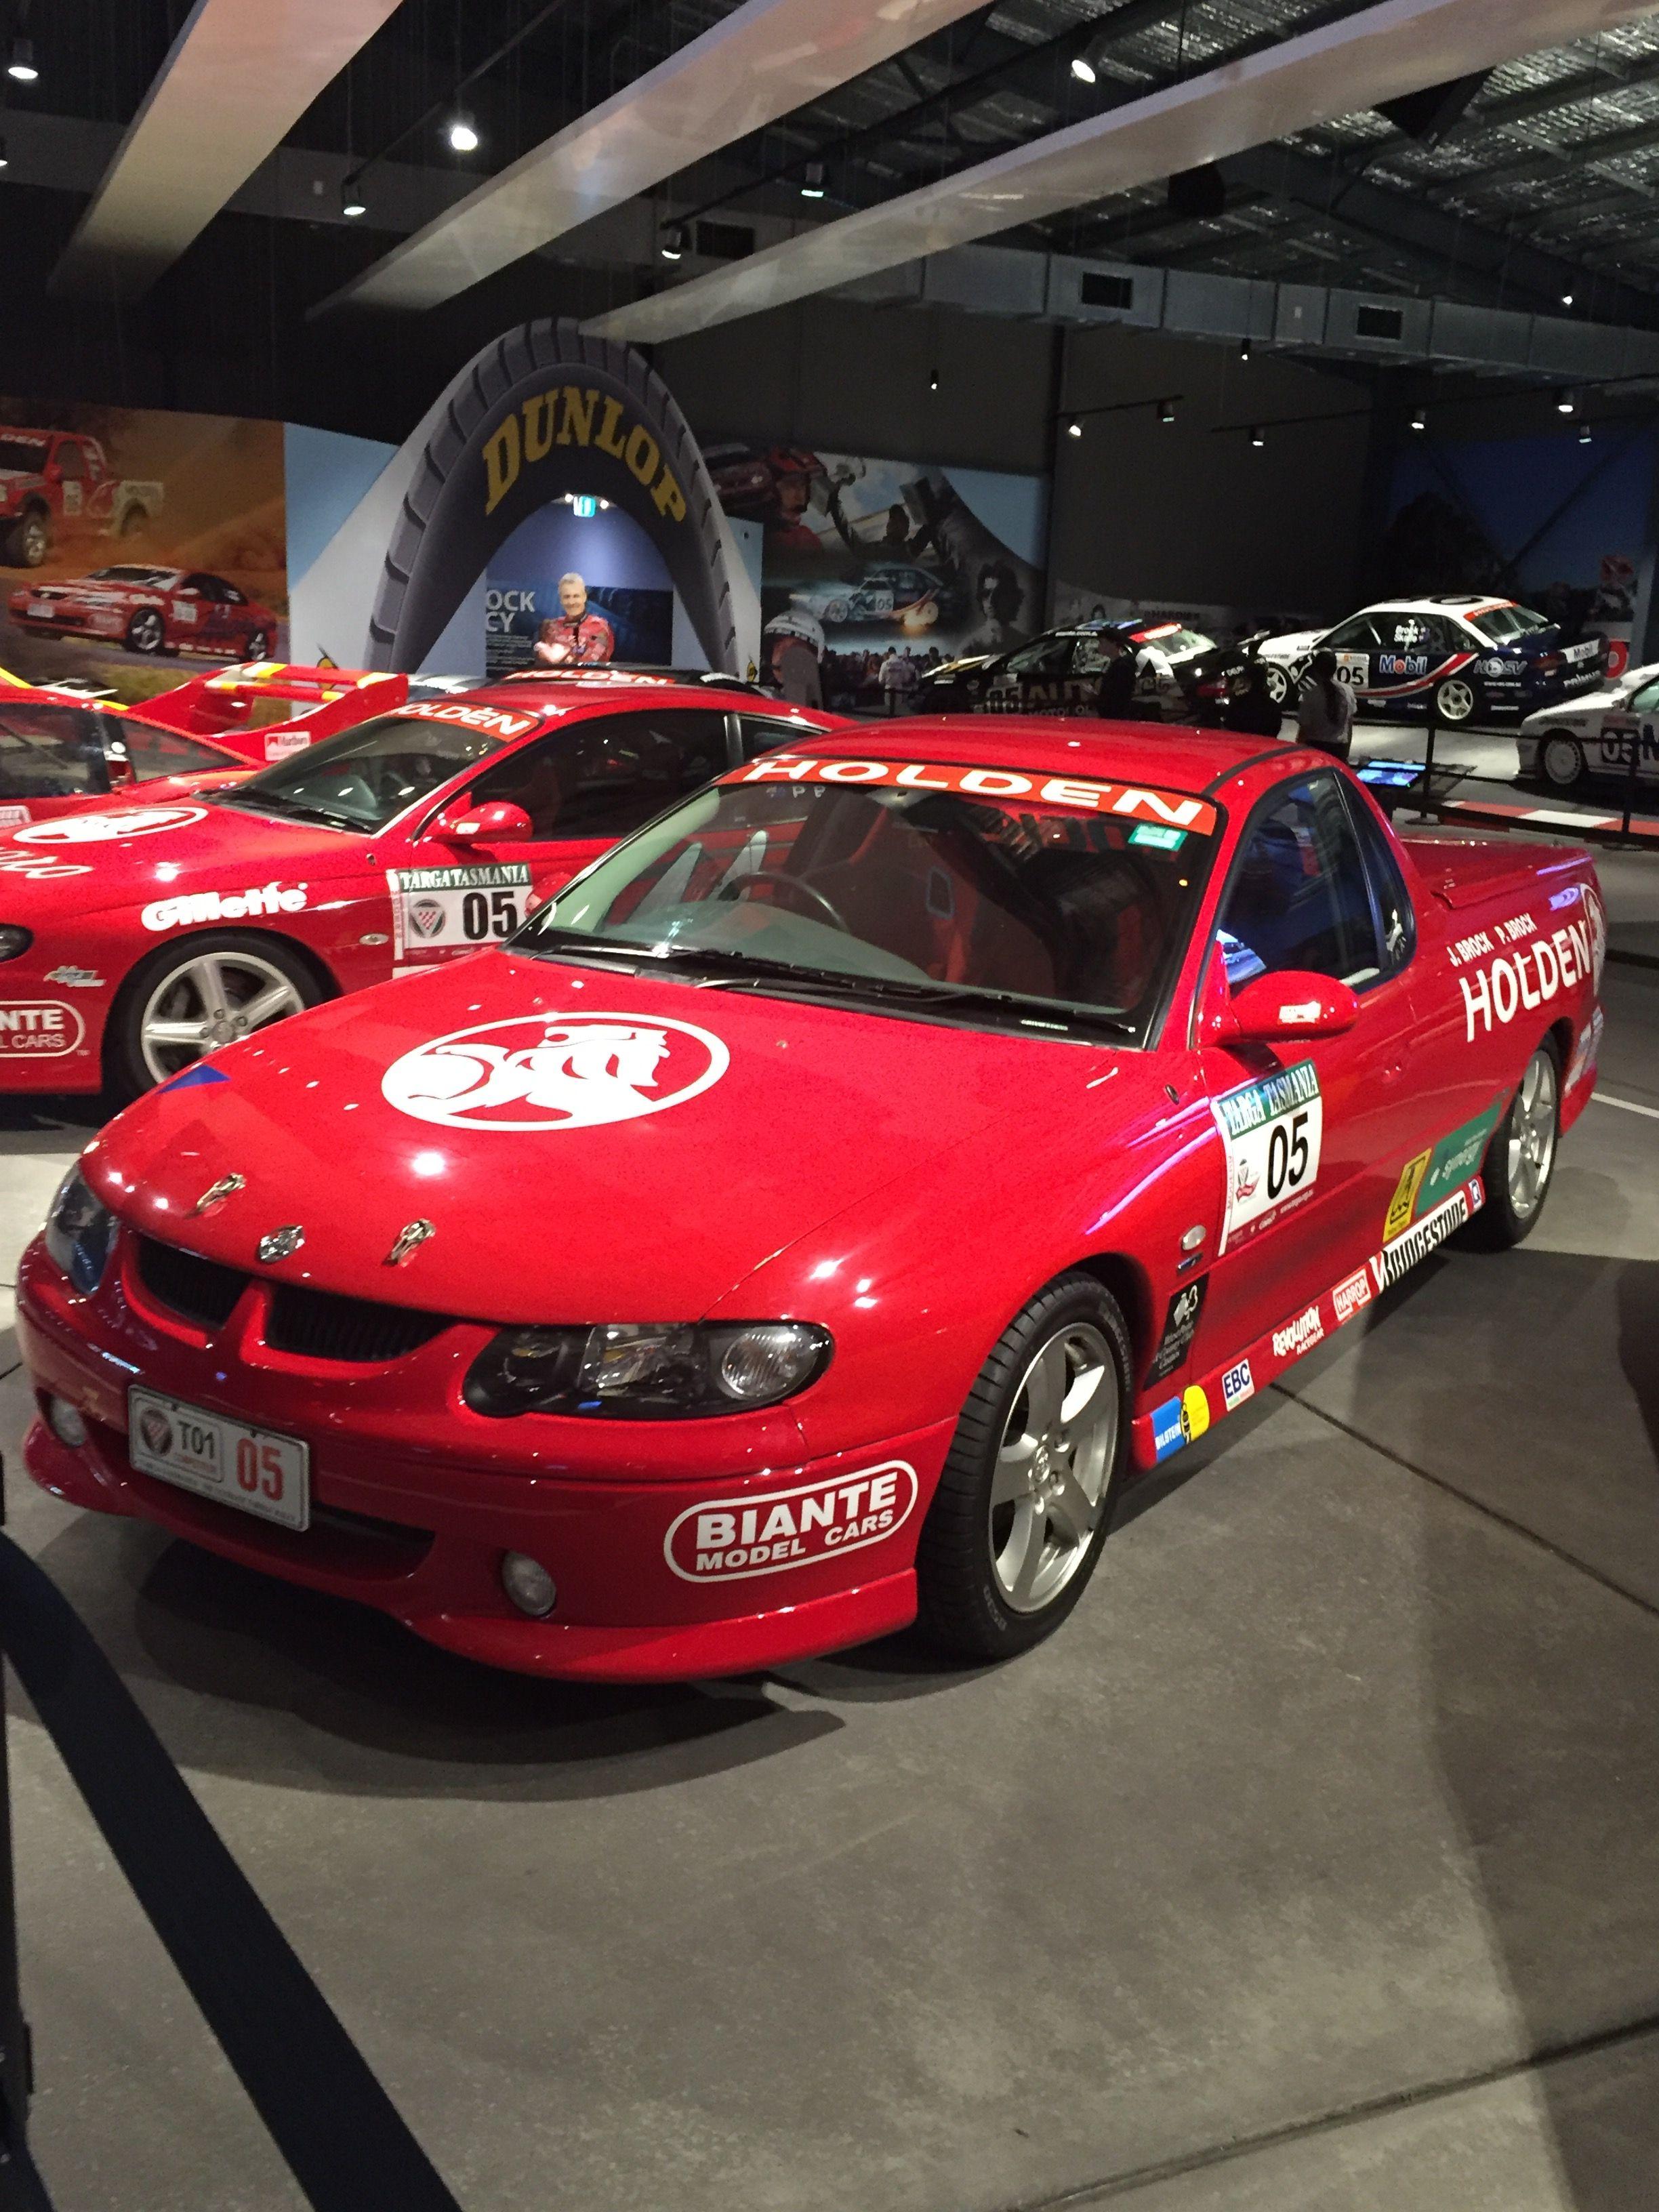 Australian cars image by E.A.K. on Arabalar Old race